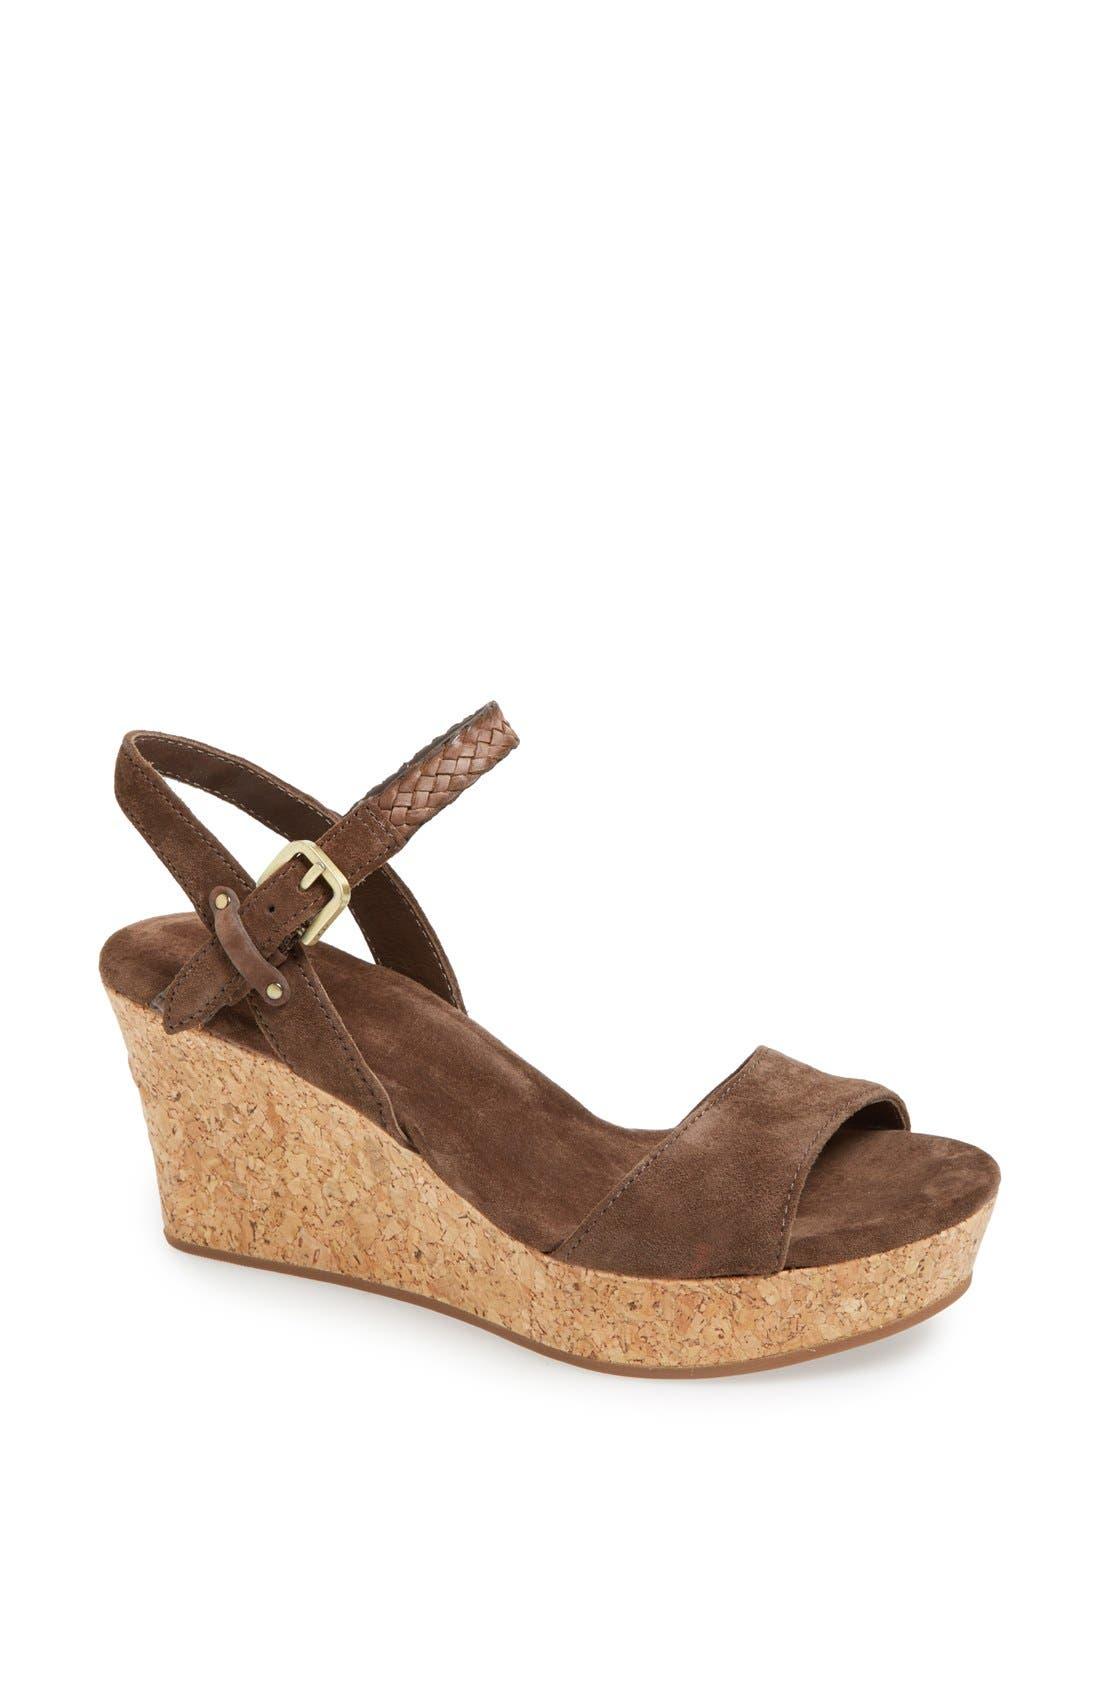 Main Image - UGG® Australia 'D'Alessio' Sandal